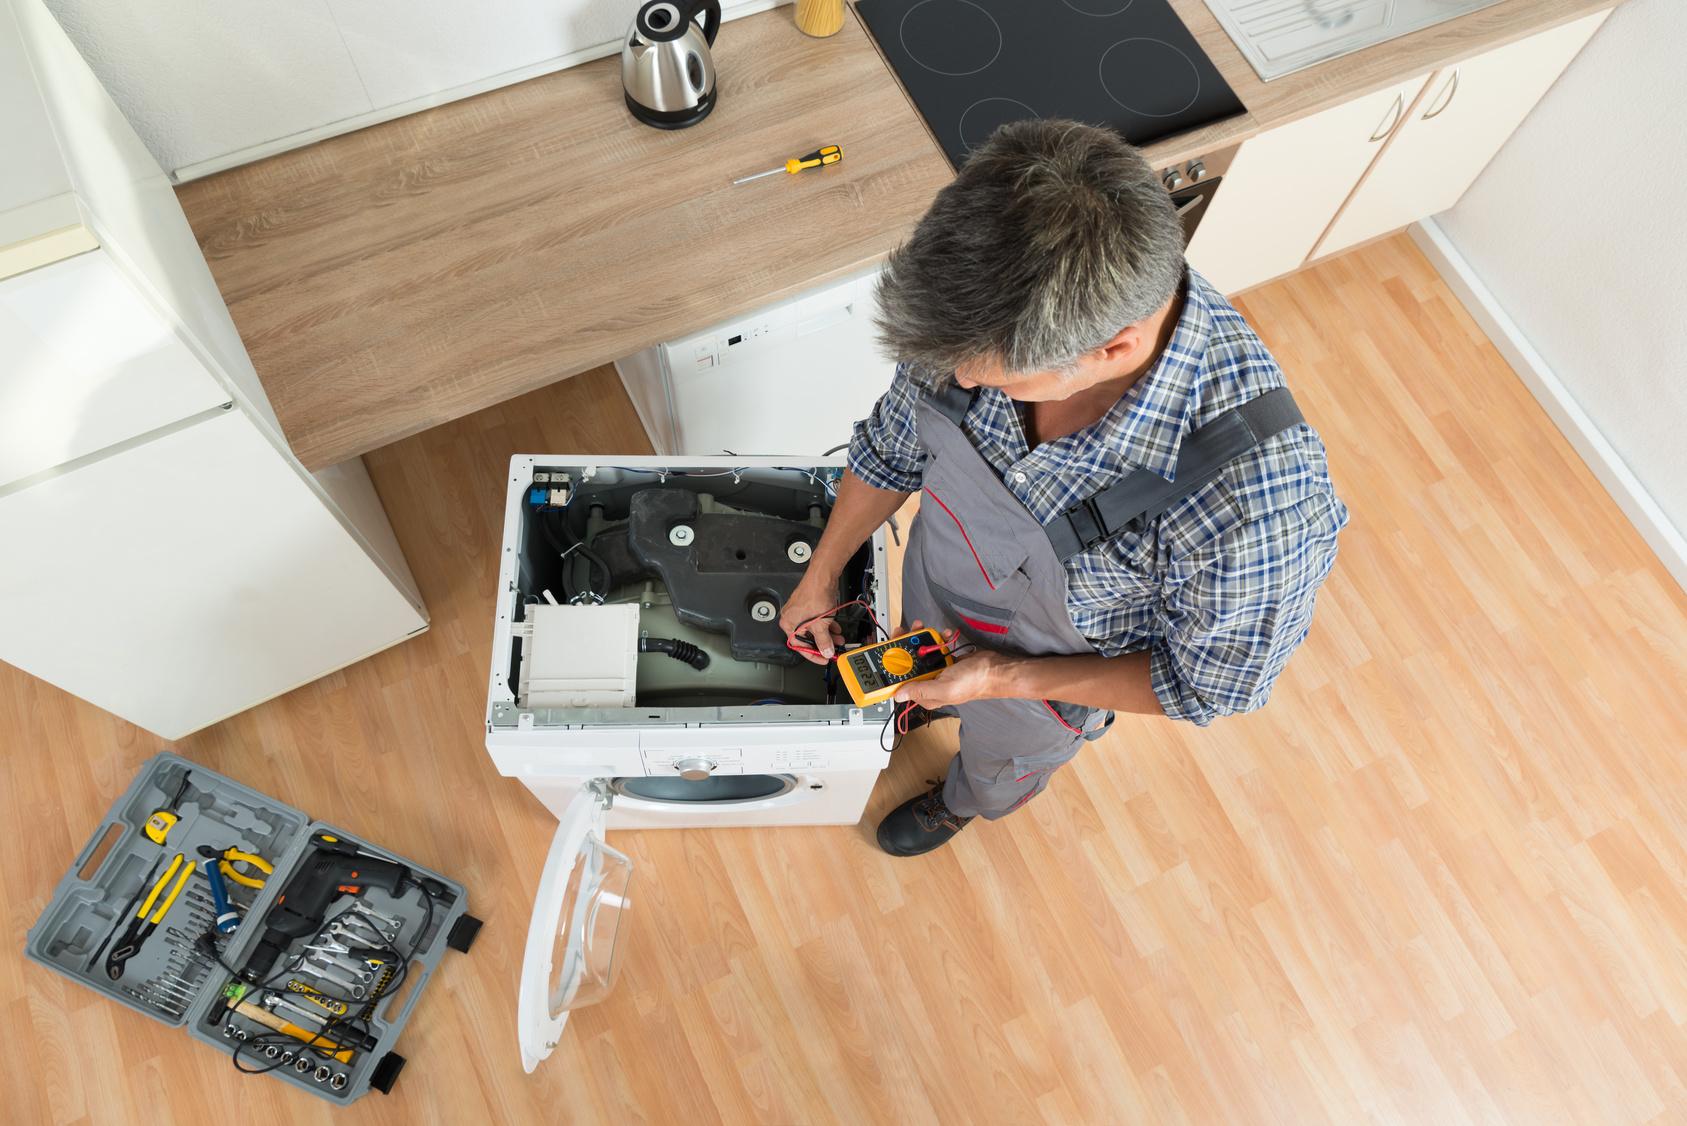 den richtigen elektriker f r den richtigen job finden. Black Bedroom Furniture Sets. Home Design Ideas